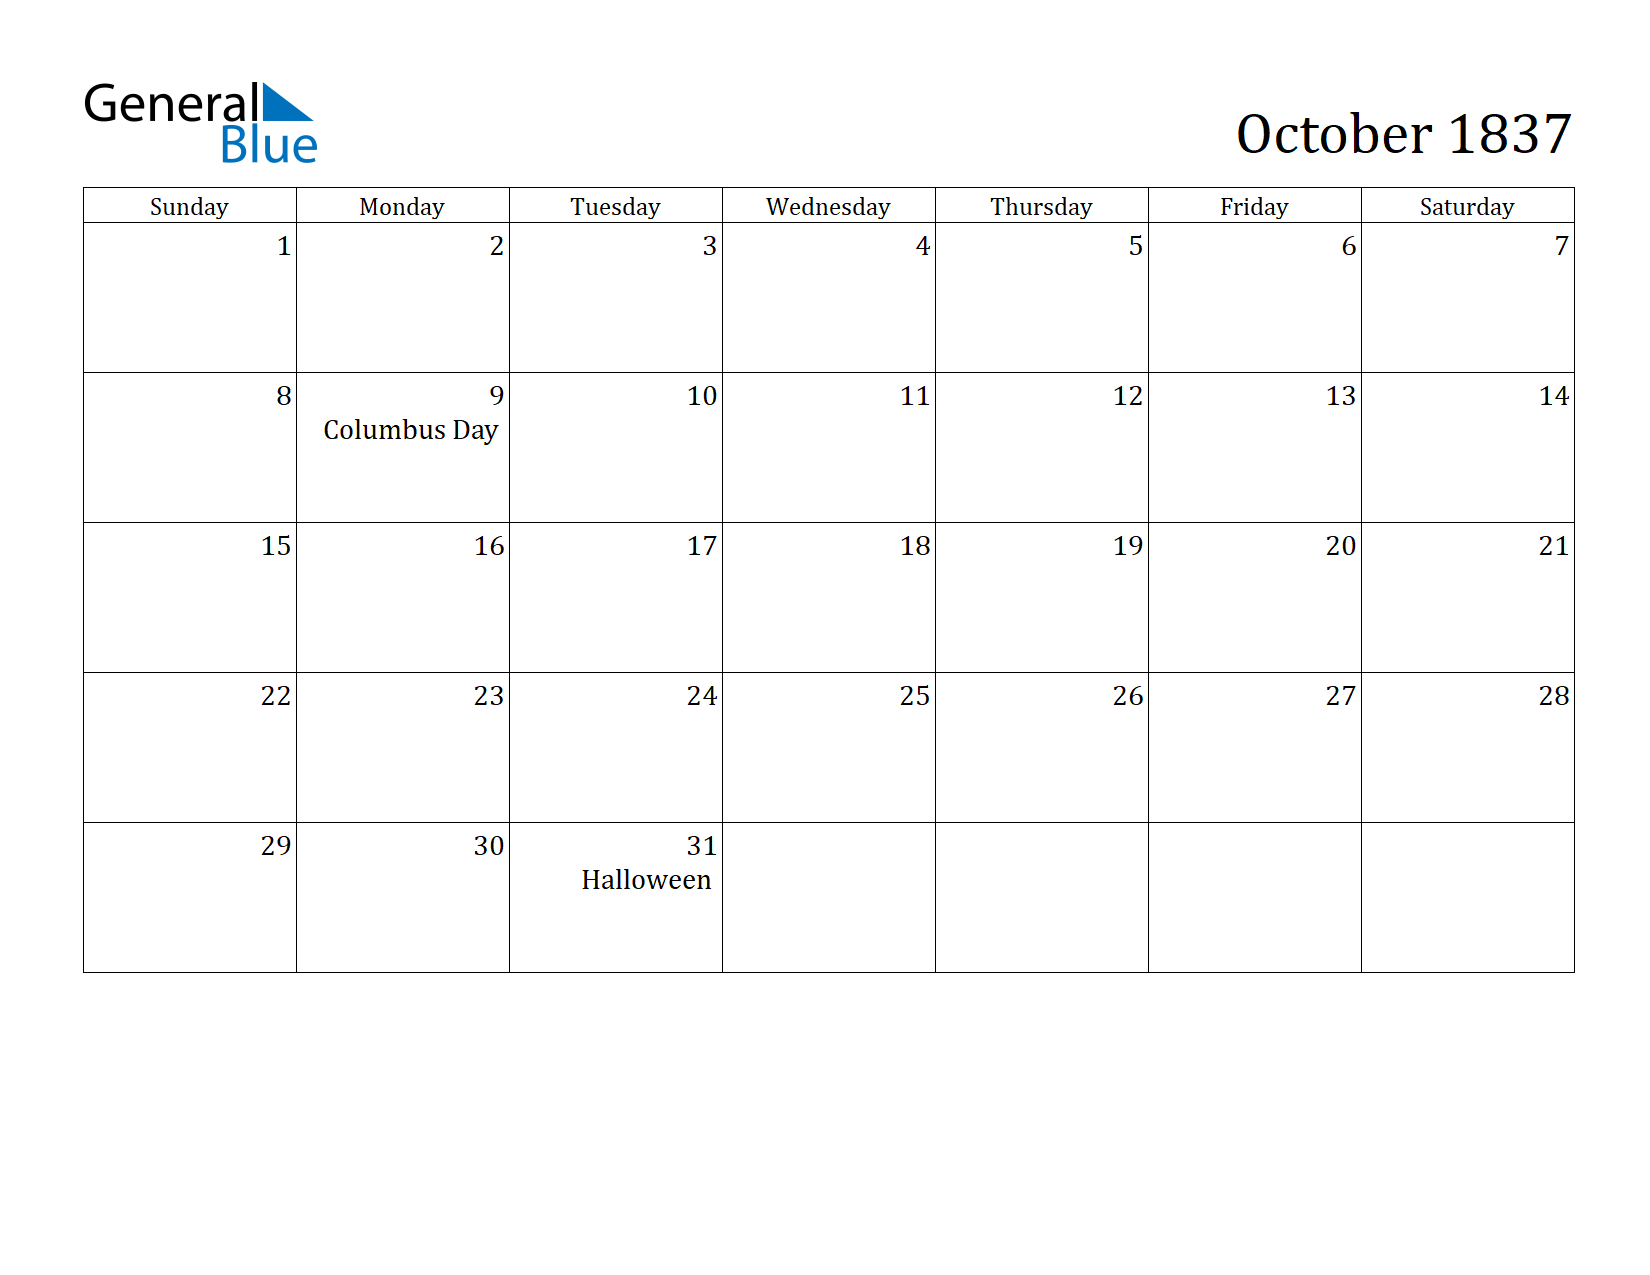 Image of October 1837 Calendar